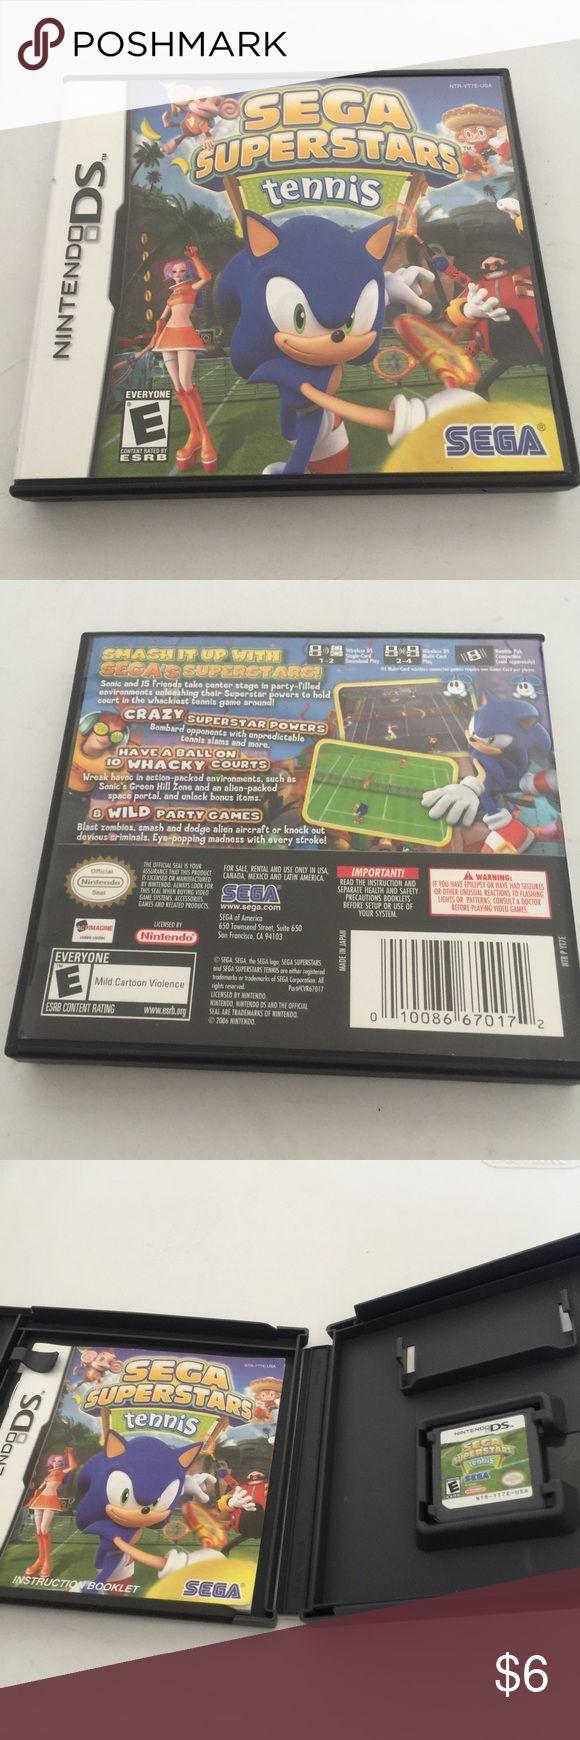 Nintendo DS Sega Superstar Tennis Game Hello, this is a Nintendo DS Sega Superstar Tennis Game. In excellent condition. Final Price Other